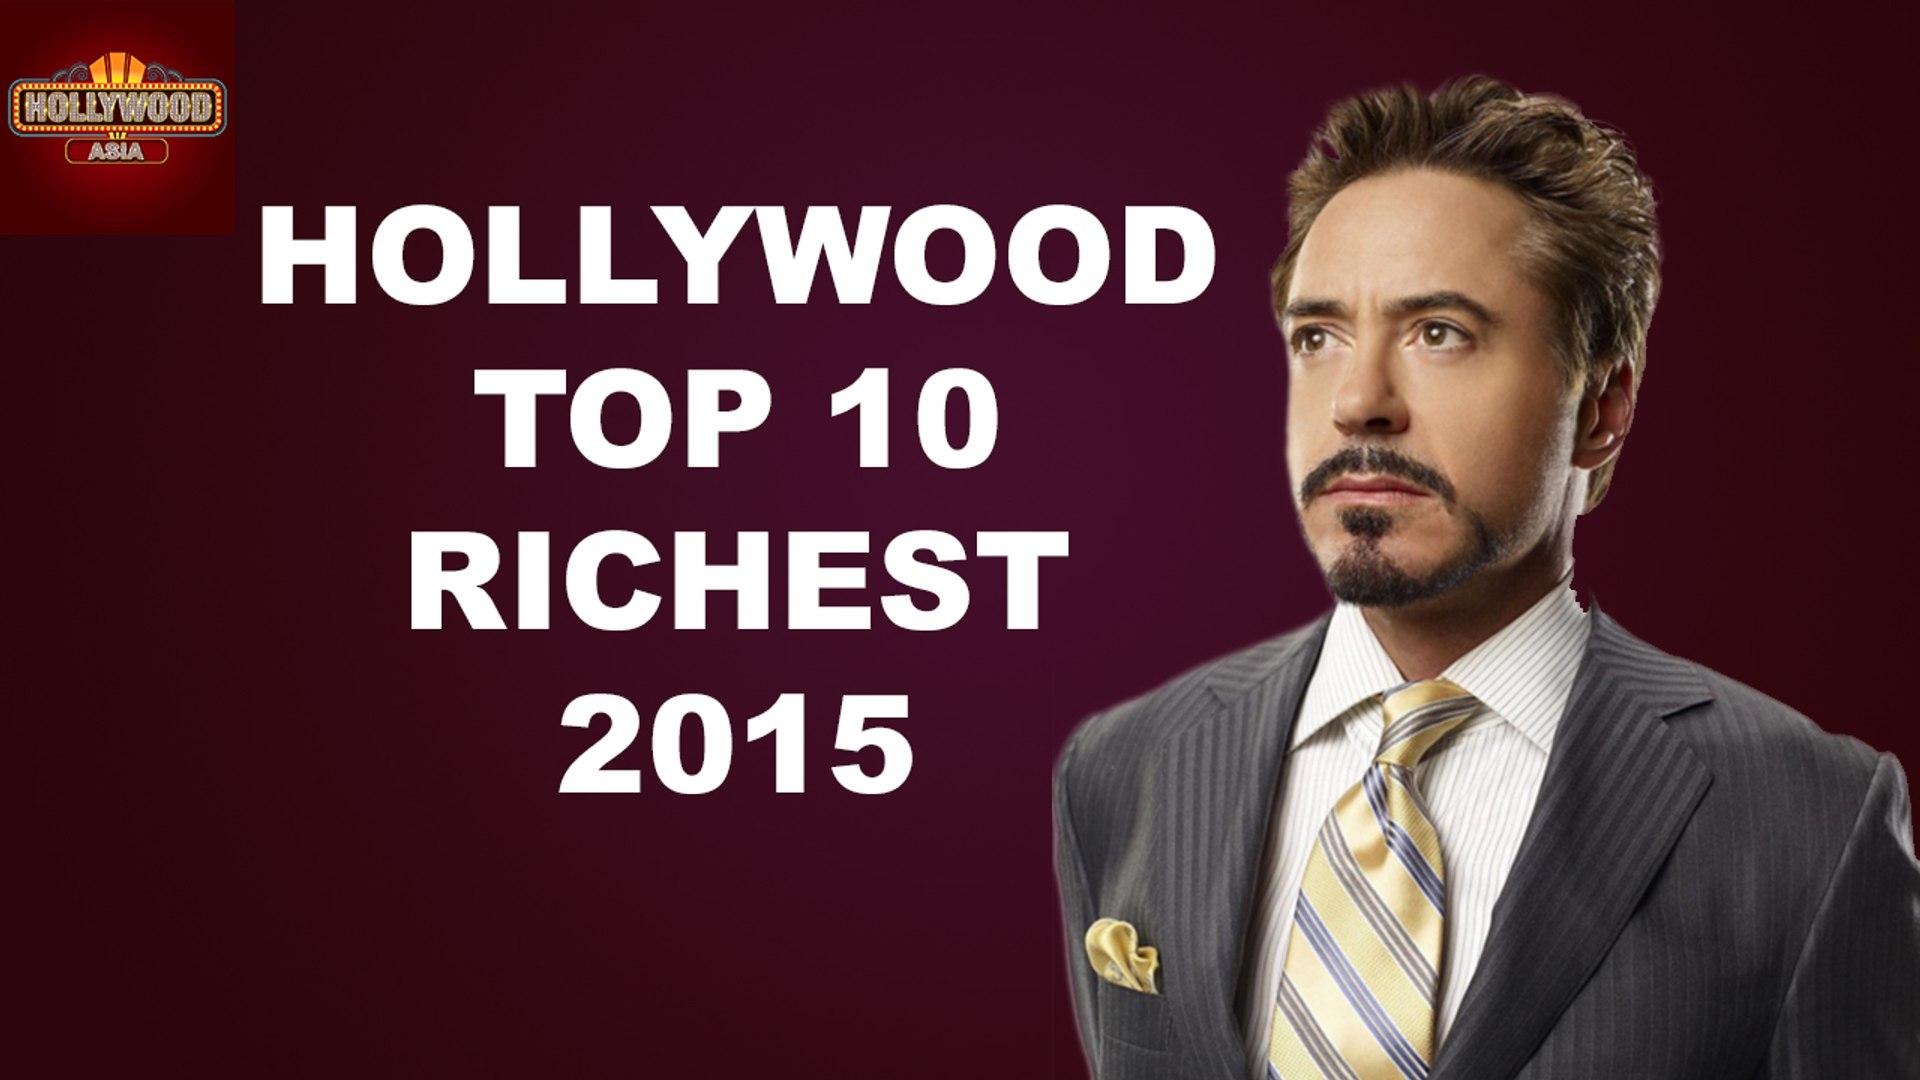 Hollywood TOP 10 RICHEST 2015 | Hollywood Gossip